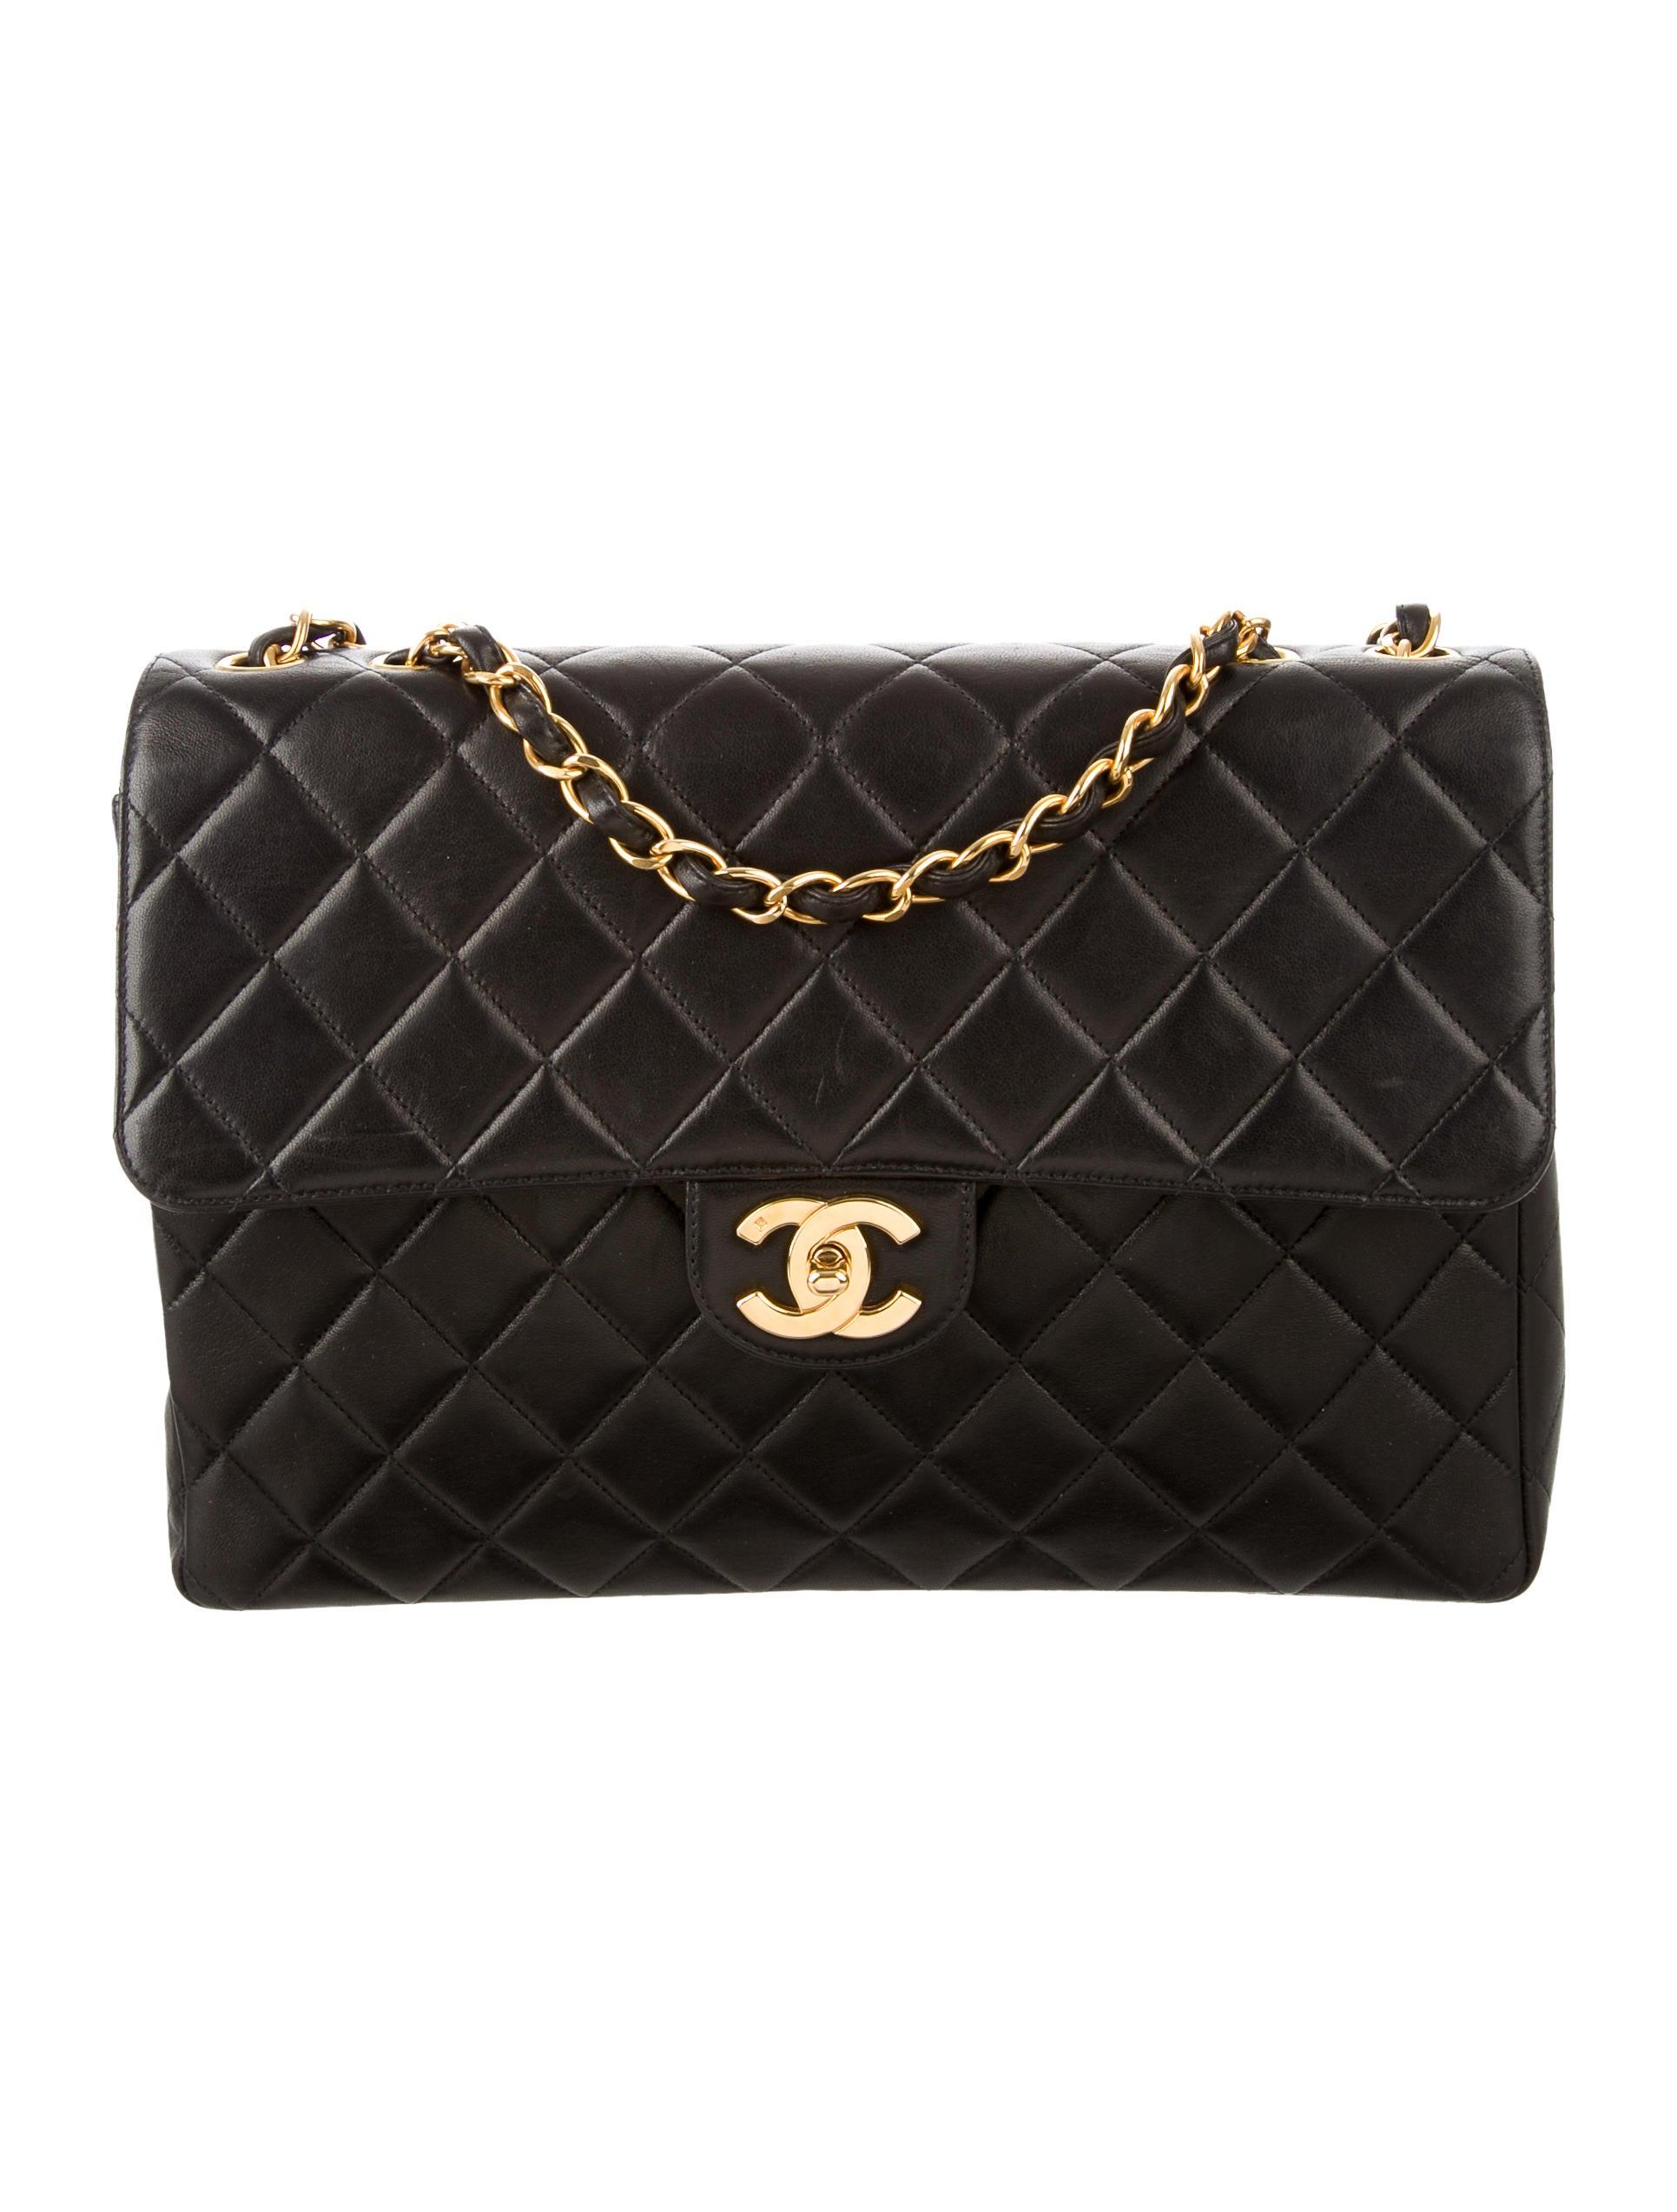 a561182cd65a97 Chanel Jumbo Classic Single Flap Bag - Handbags - CHA182897   The RealReal